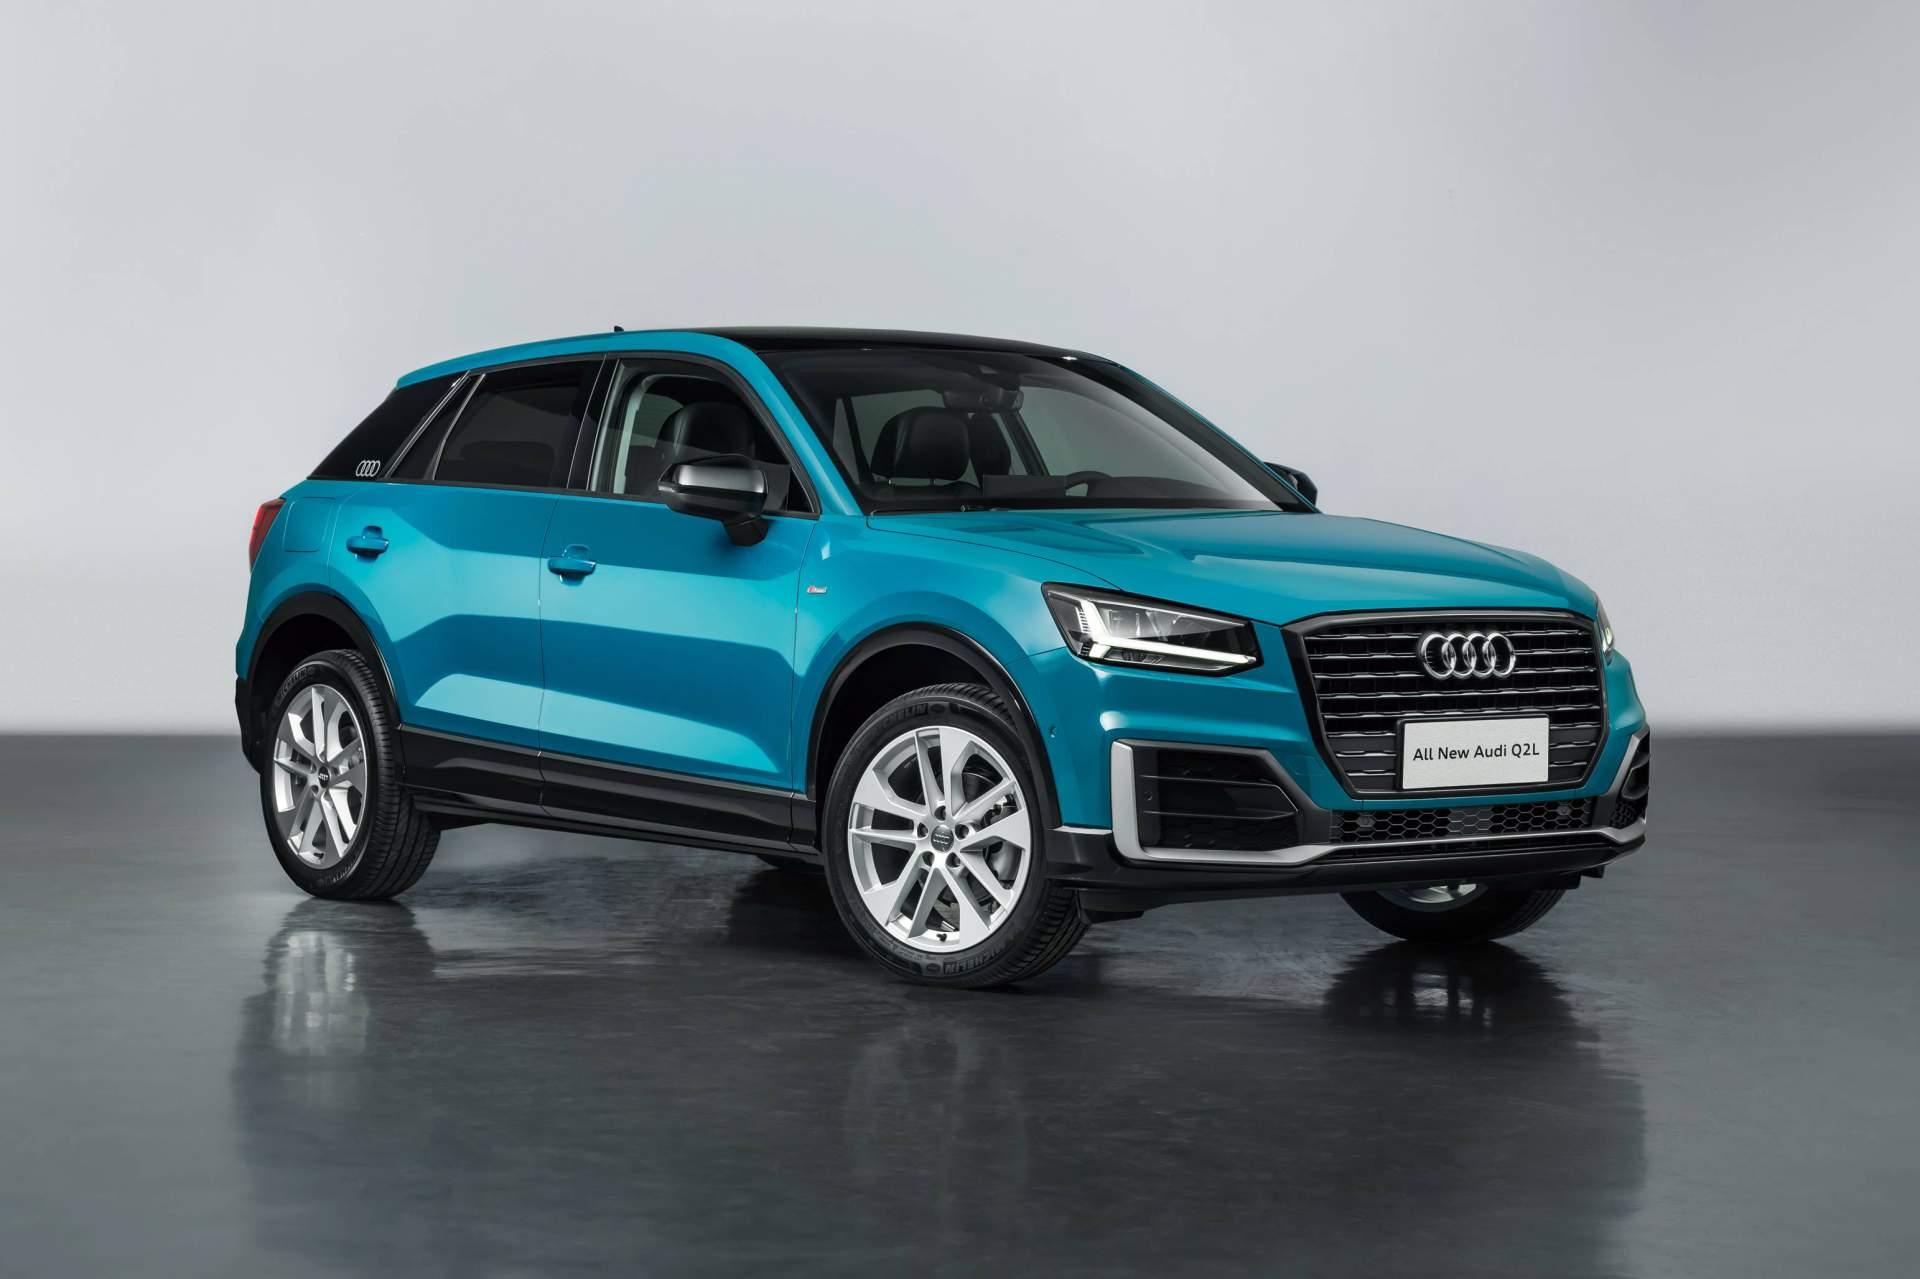 Audi_Q2_L_0065